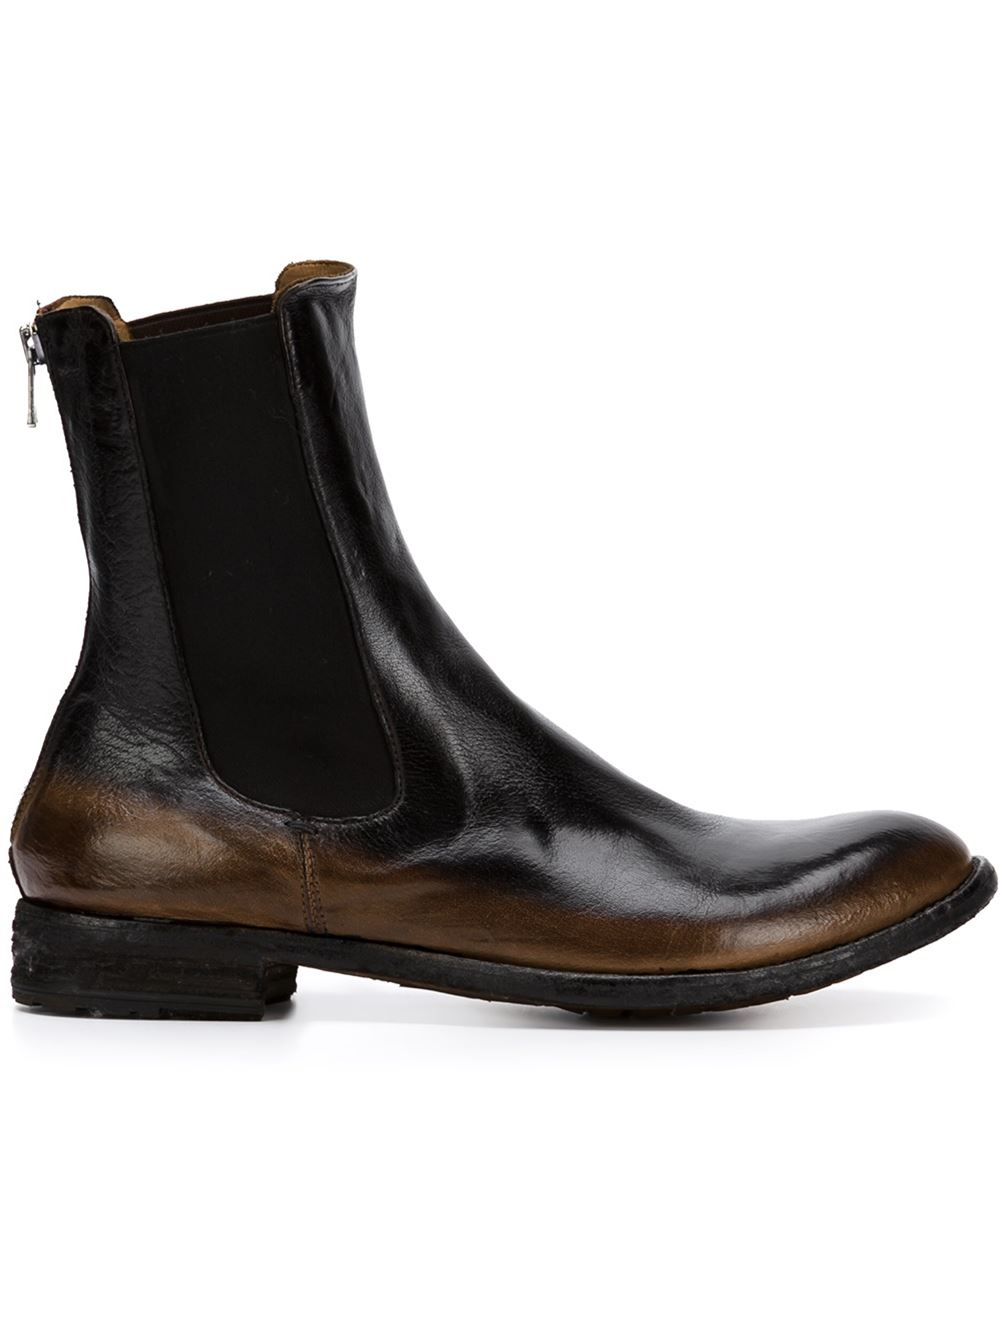 Fantastic Officine Creative Womenu2019s Mid-calf Boots U2013 Aallshoestyle